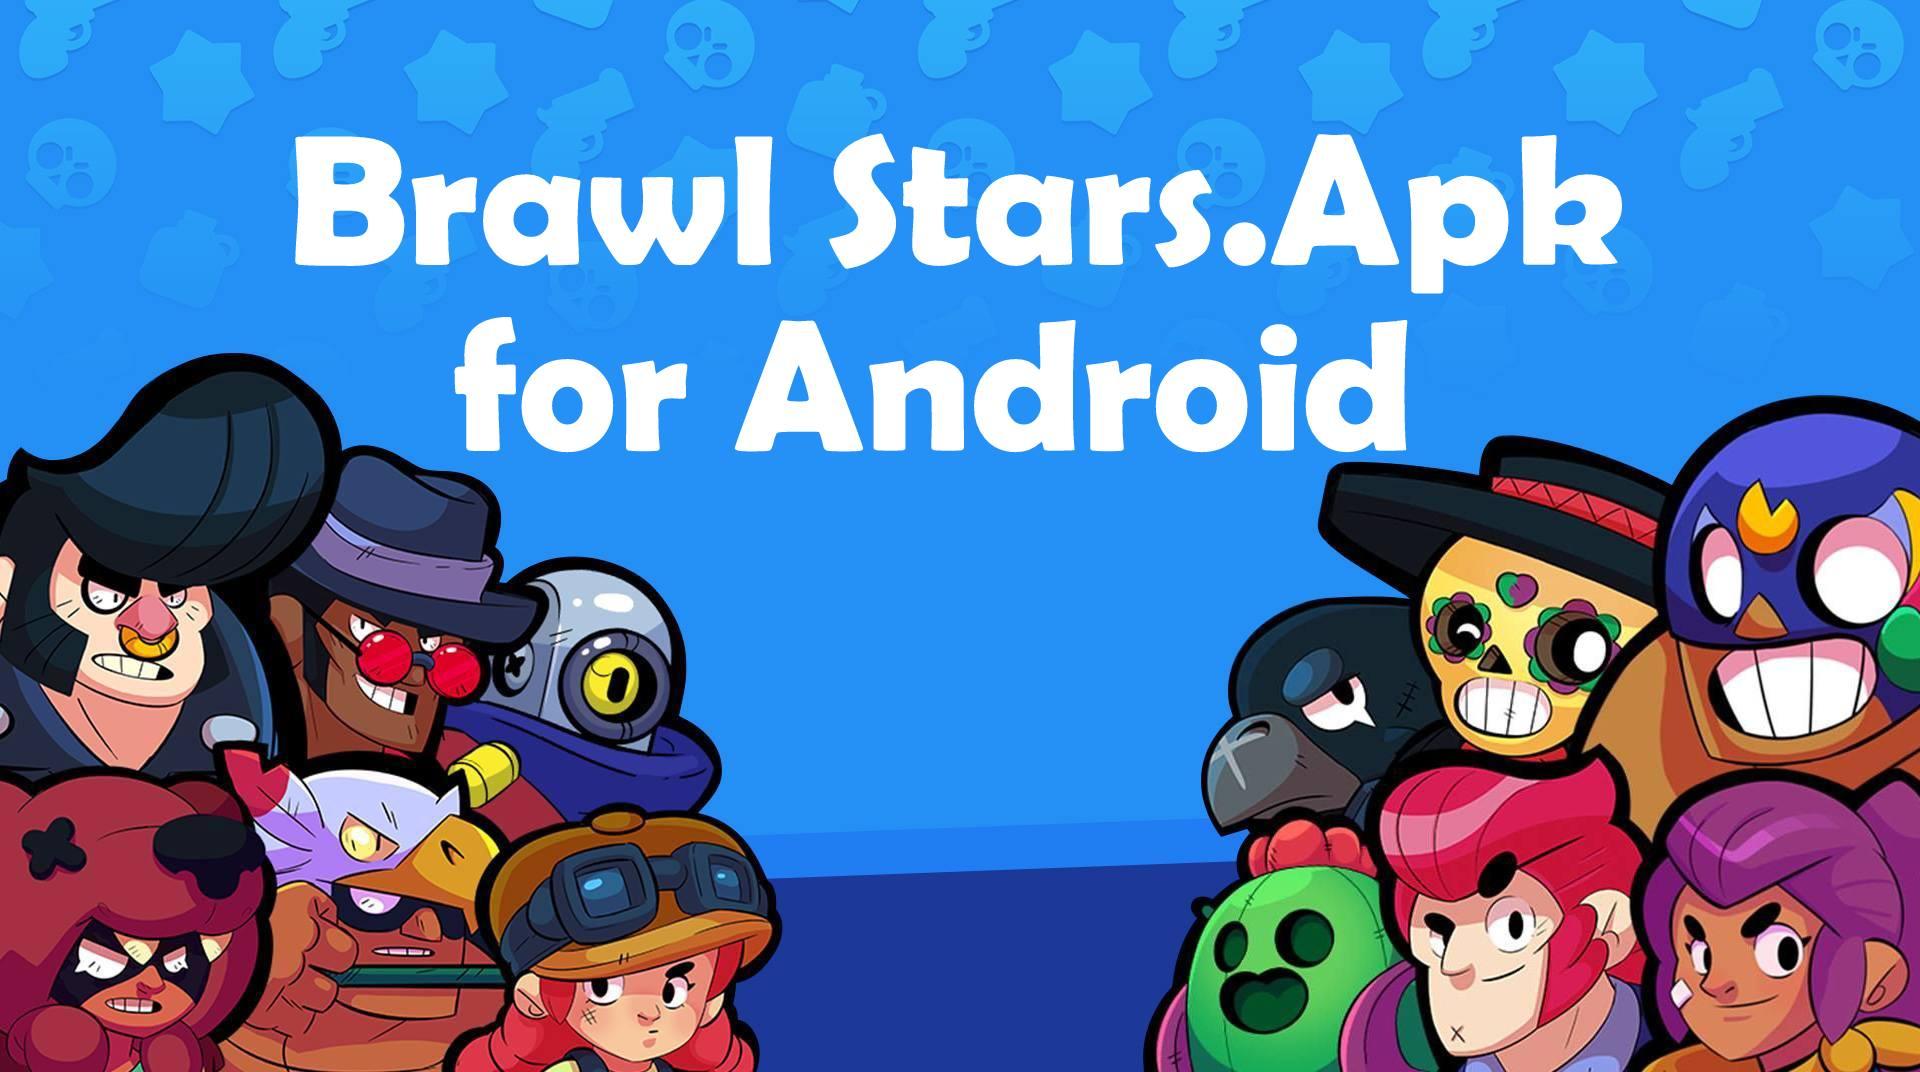 brawl-stars-apk-link